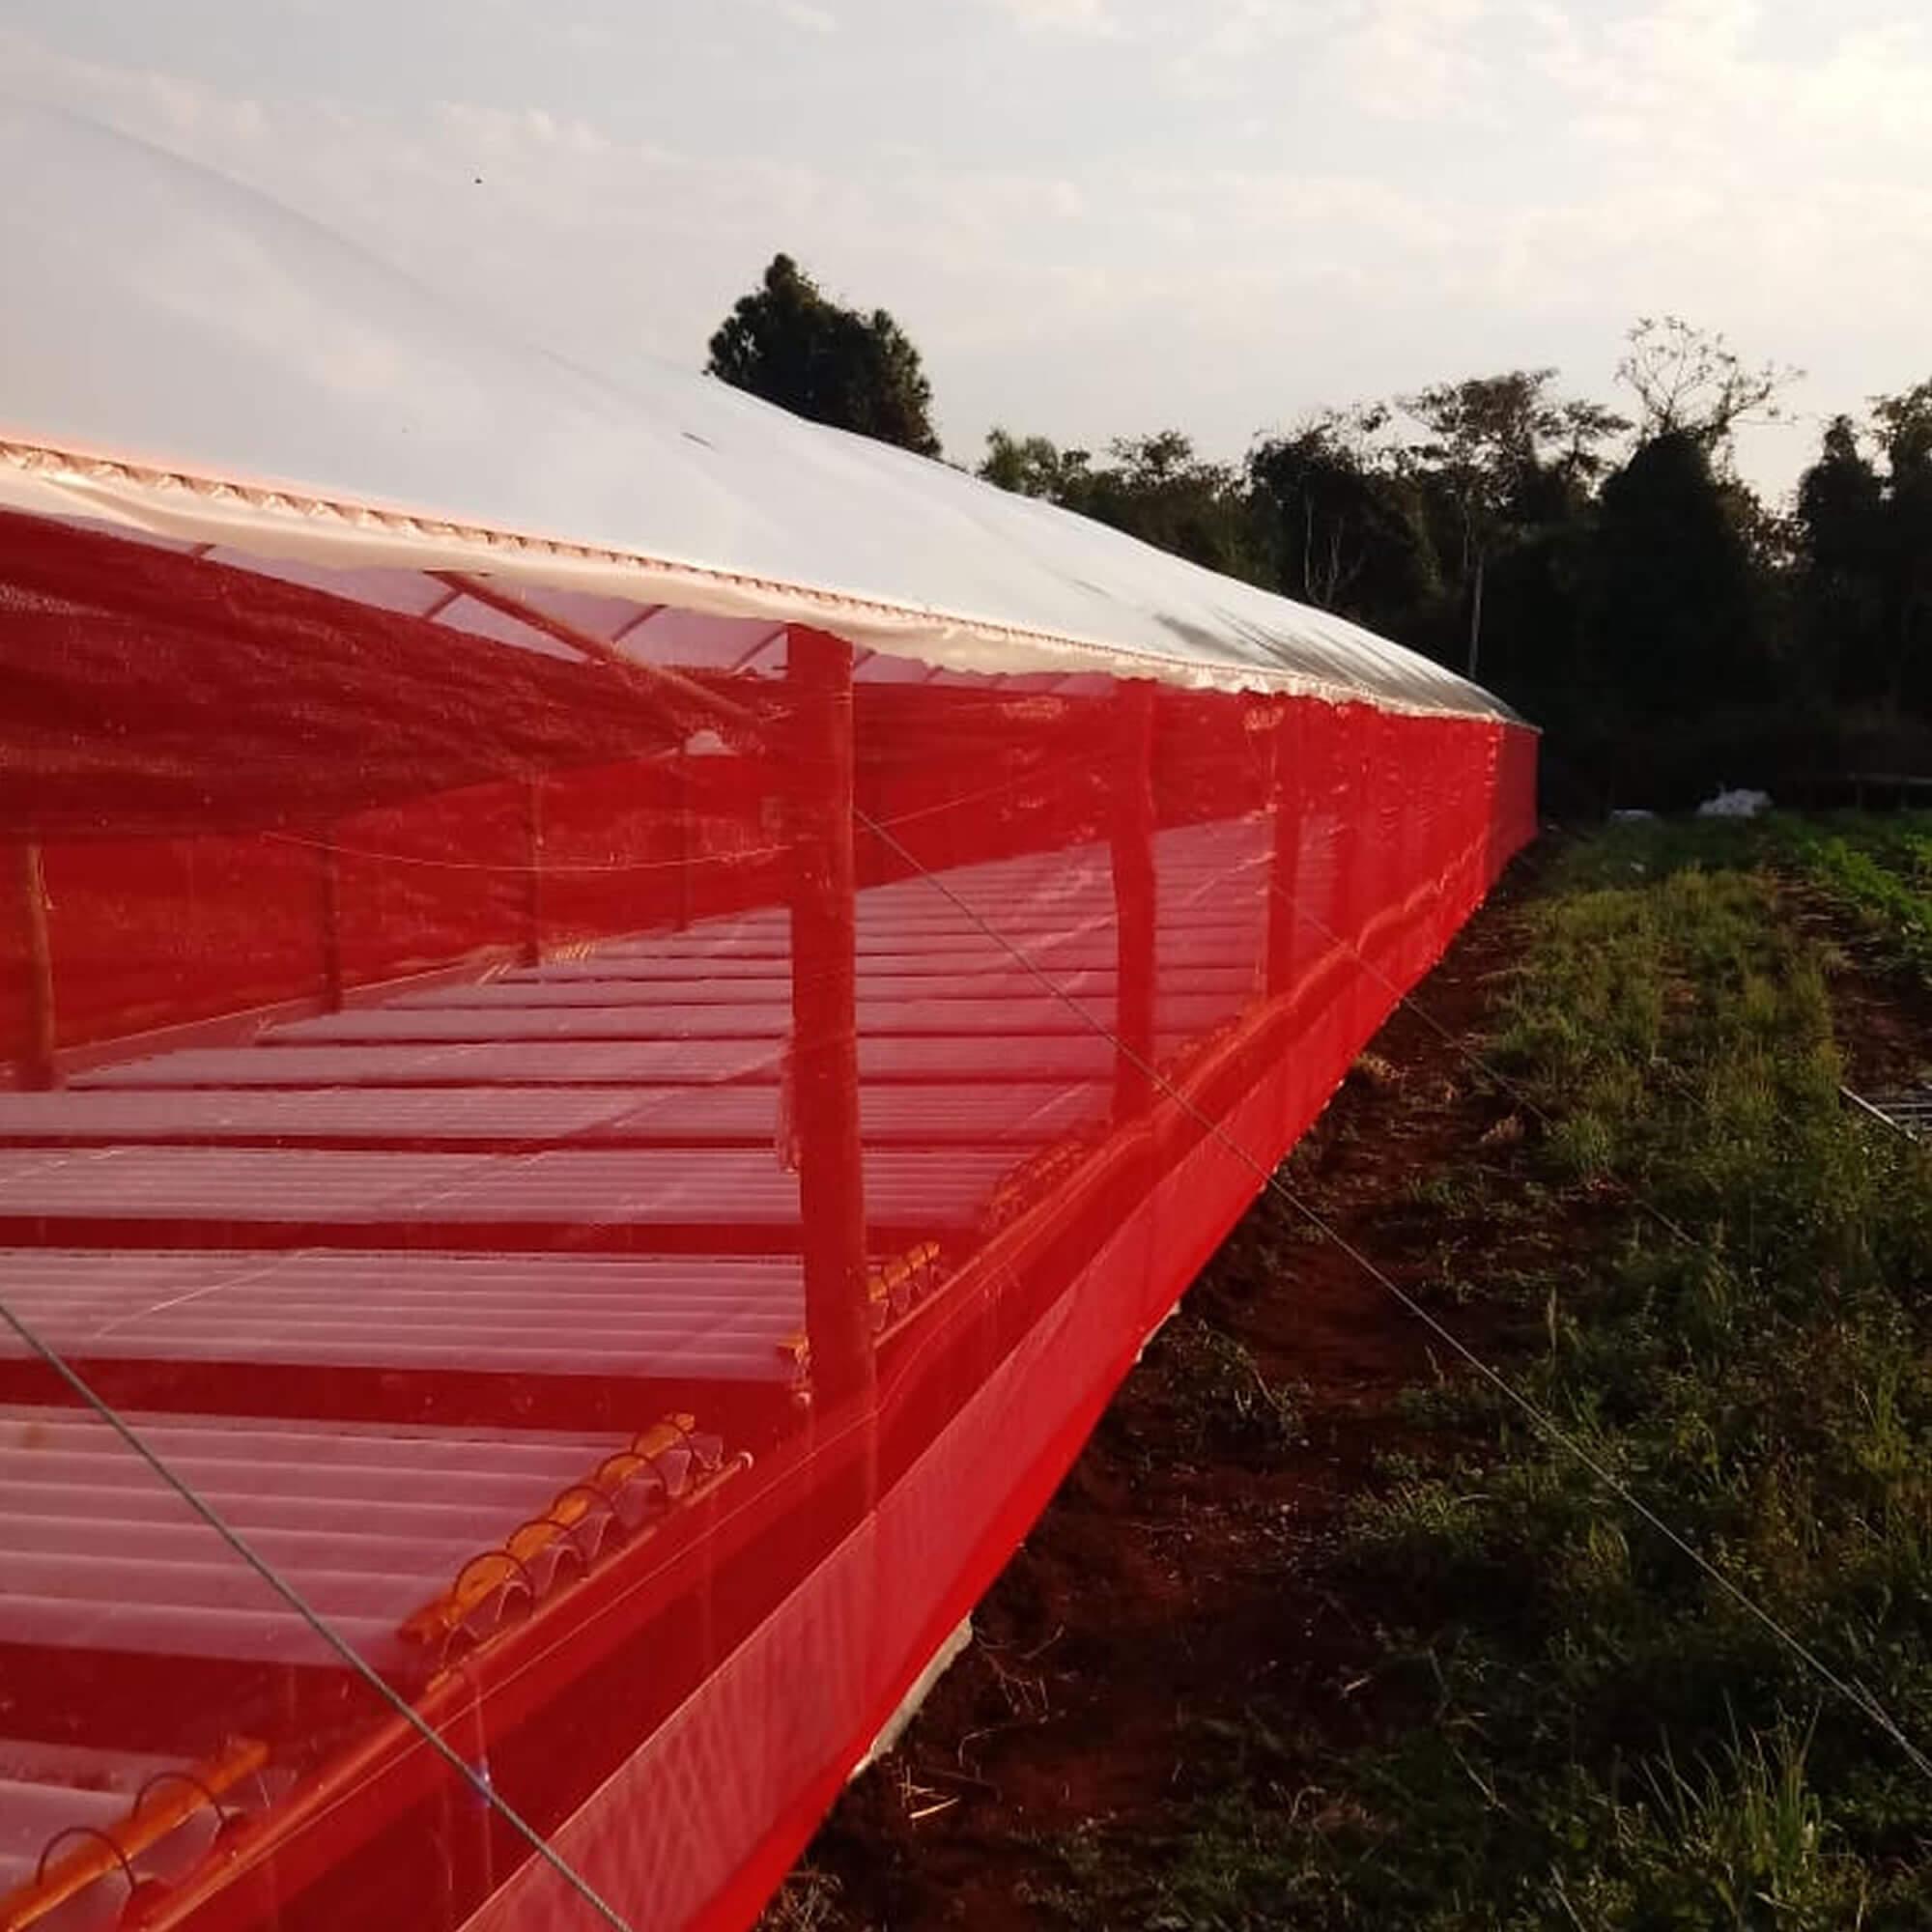 Tela de Sombreamento Vermelha 20% - 3 x 20 metros